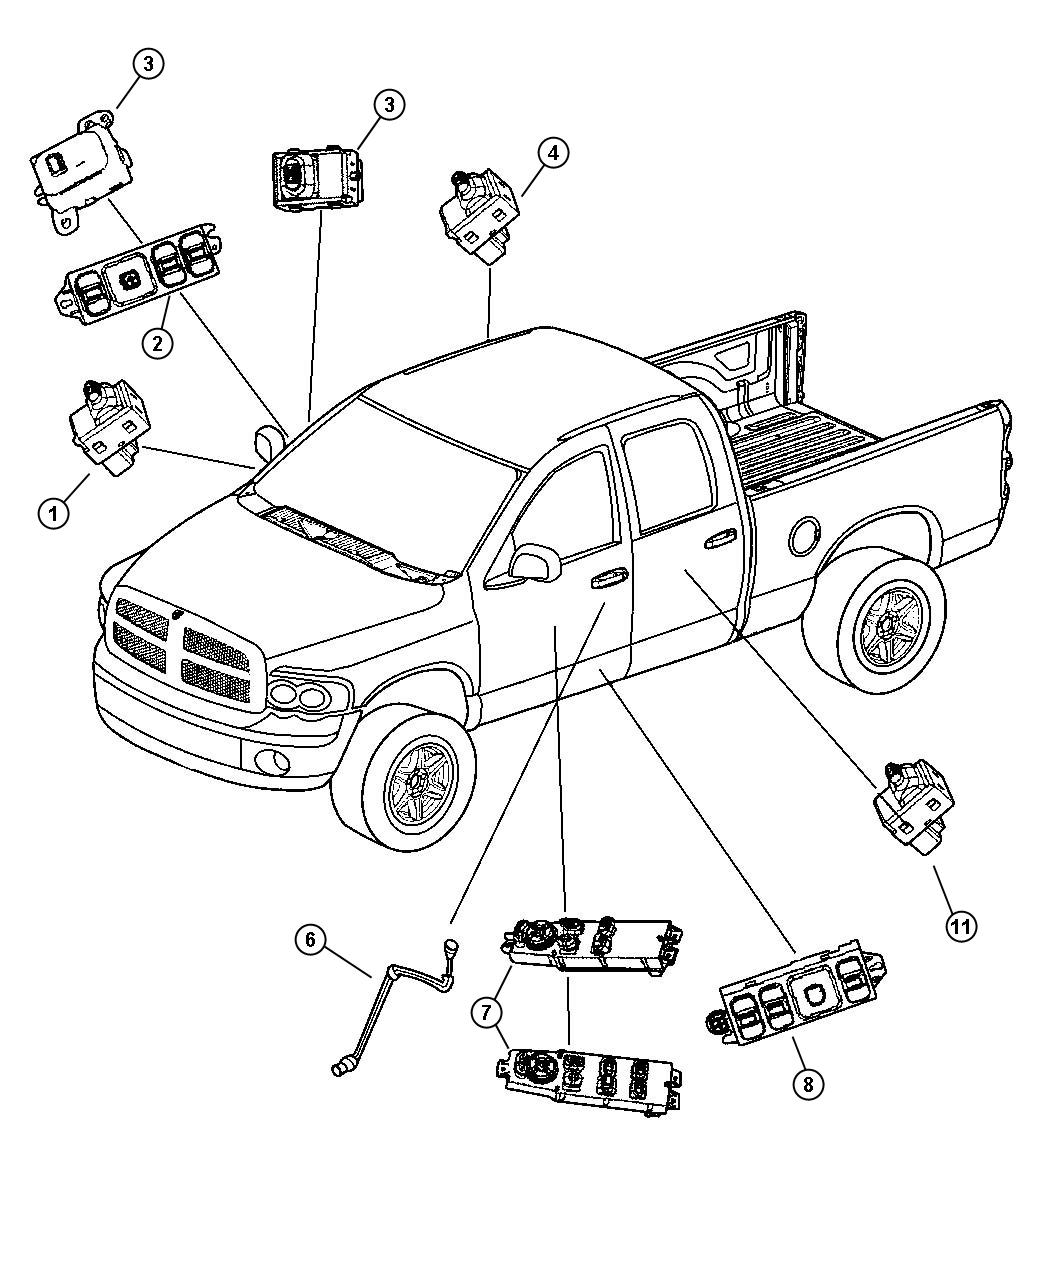 Diagram Dodge Ram Power Window Wiring Diagram Full